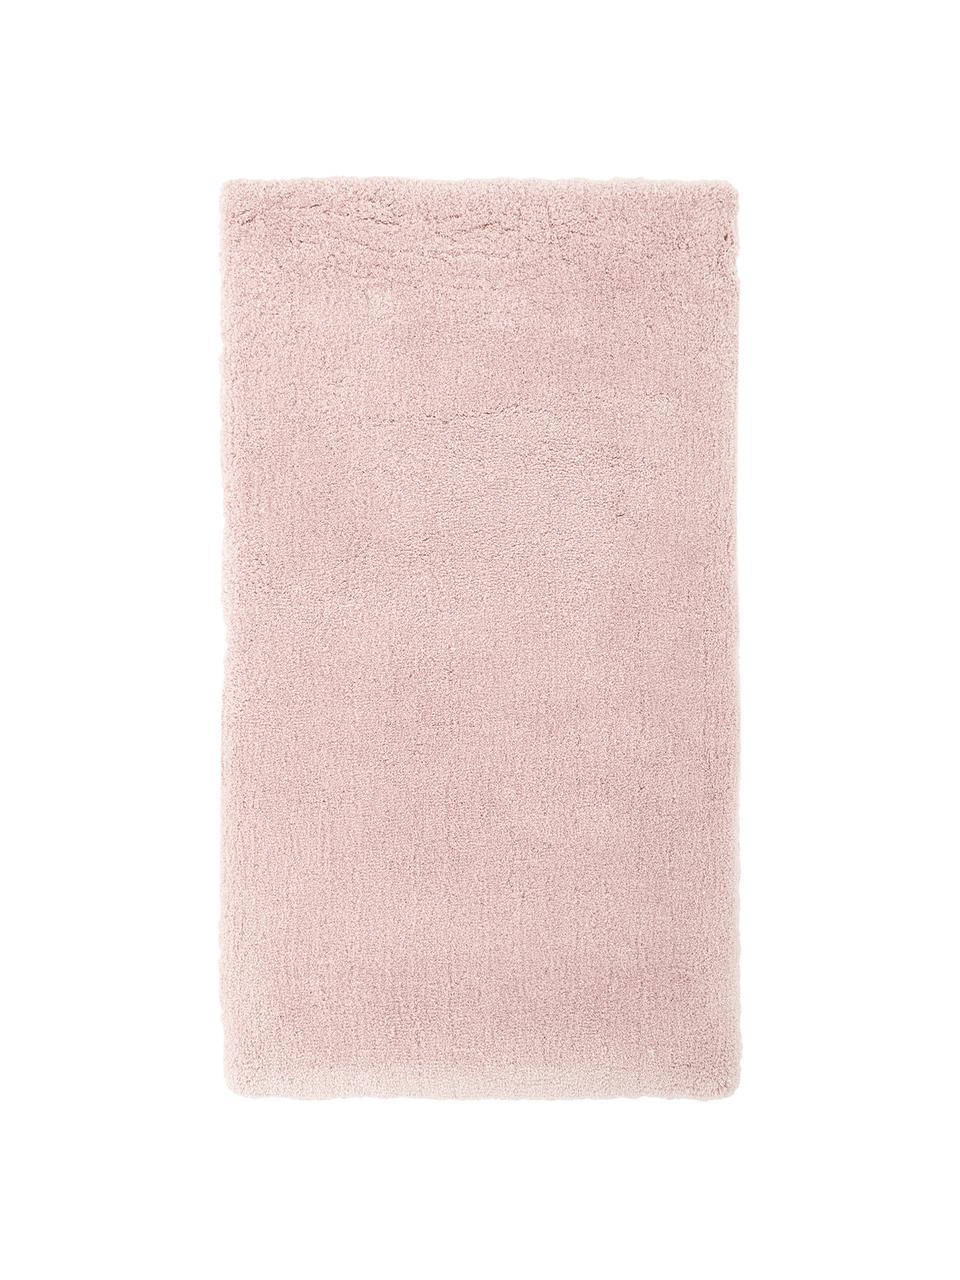 Tapis doux poils longs rose Leighton, Rosé